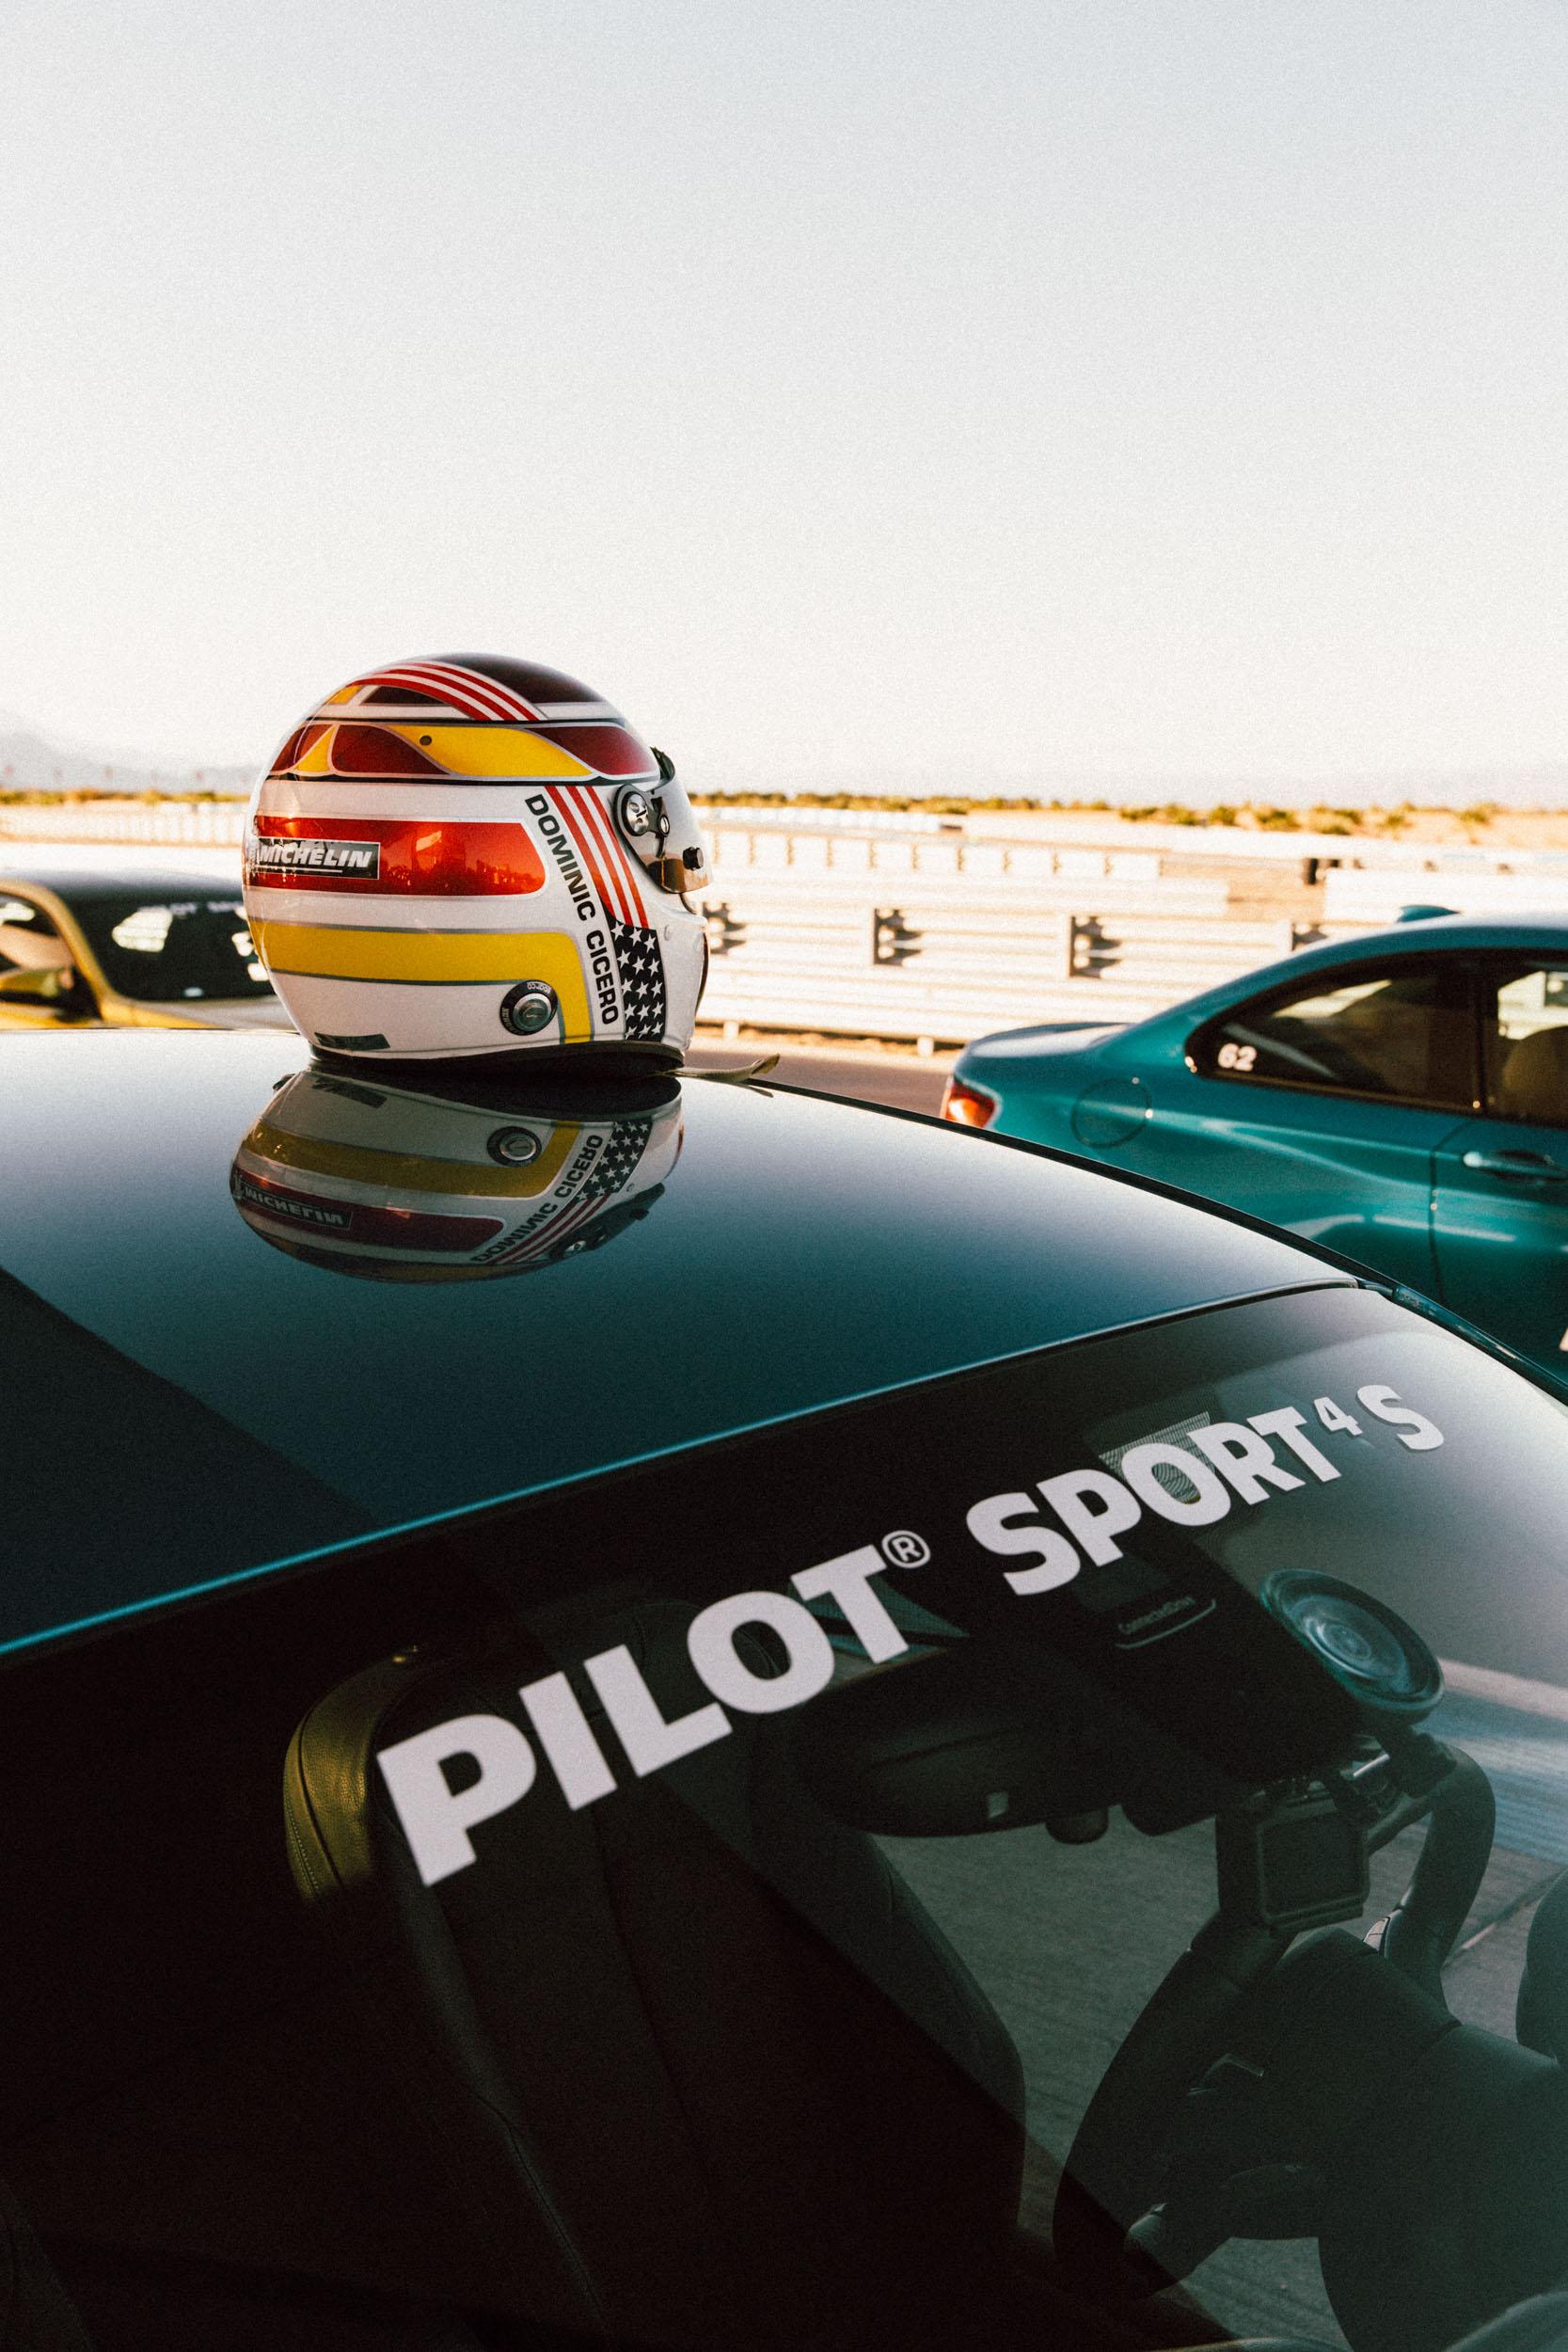 Pilot Sport Experience x Michelin